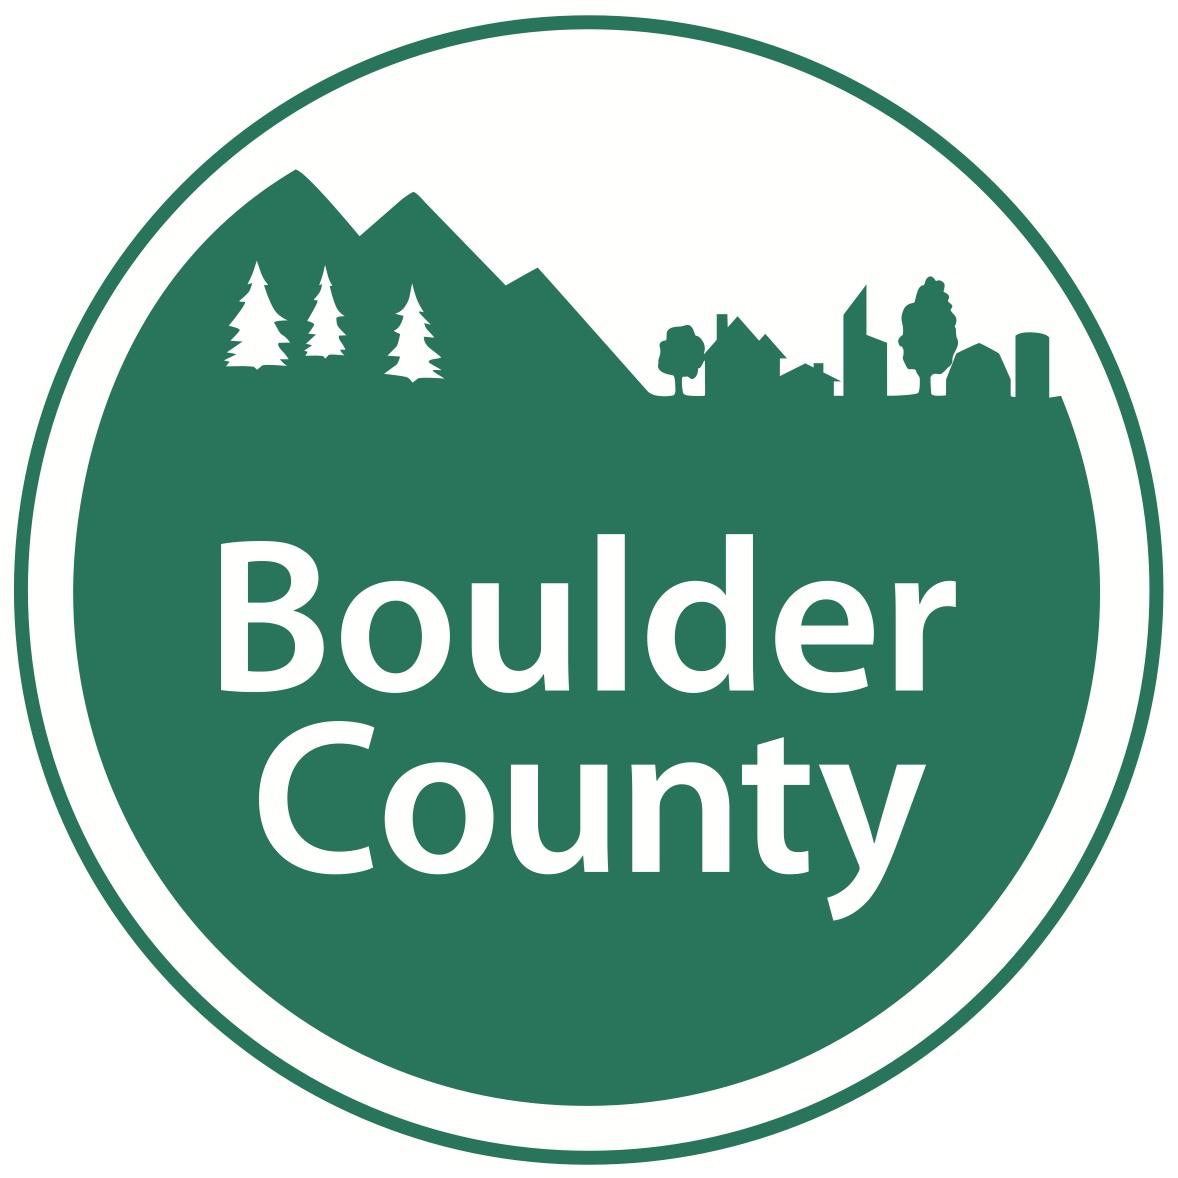 BoulderCountyLogo.jpg